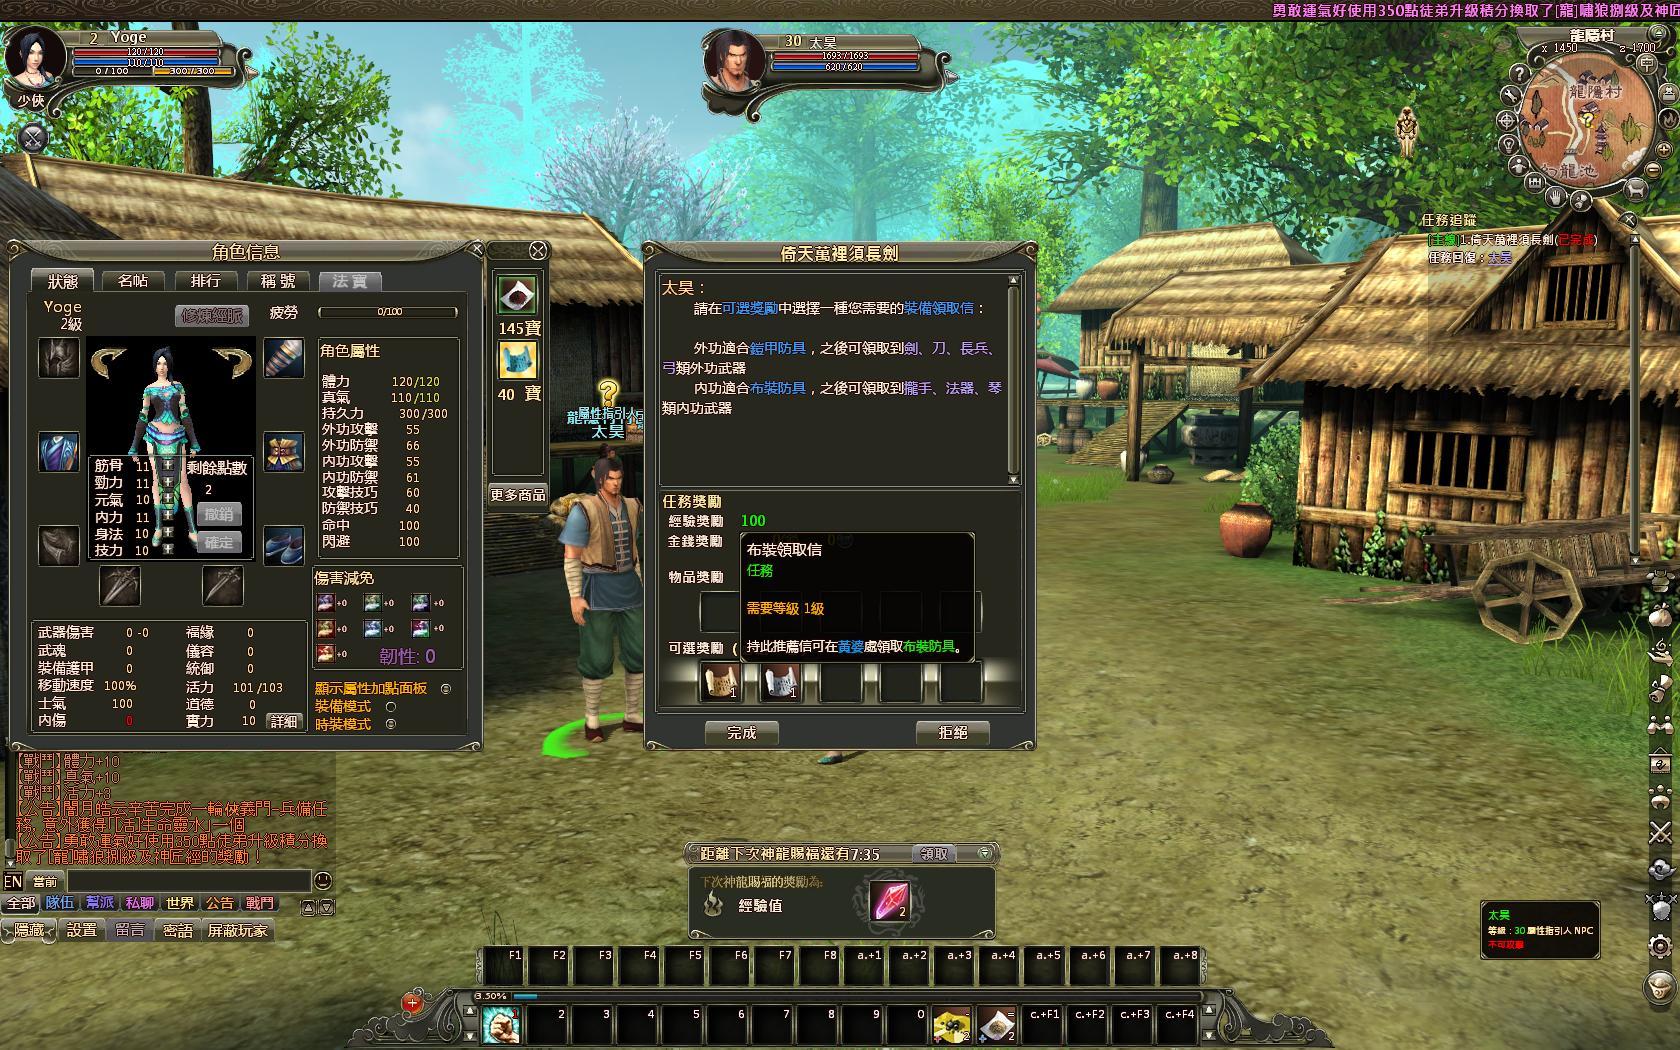 LoongScreenshot[10-7-2010 232512]-40217525